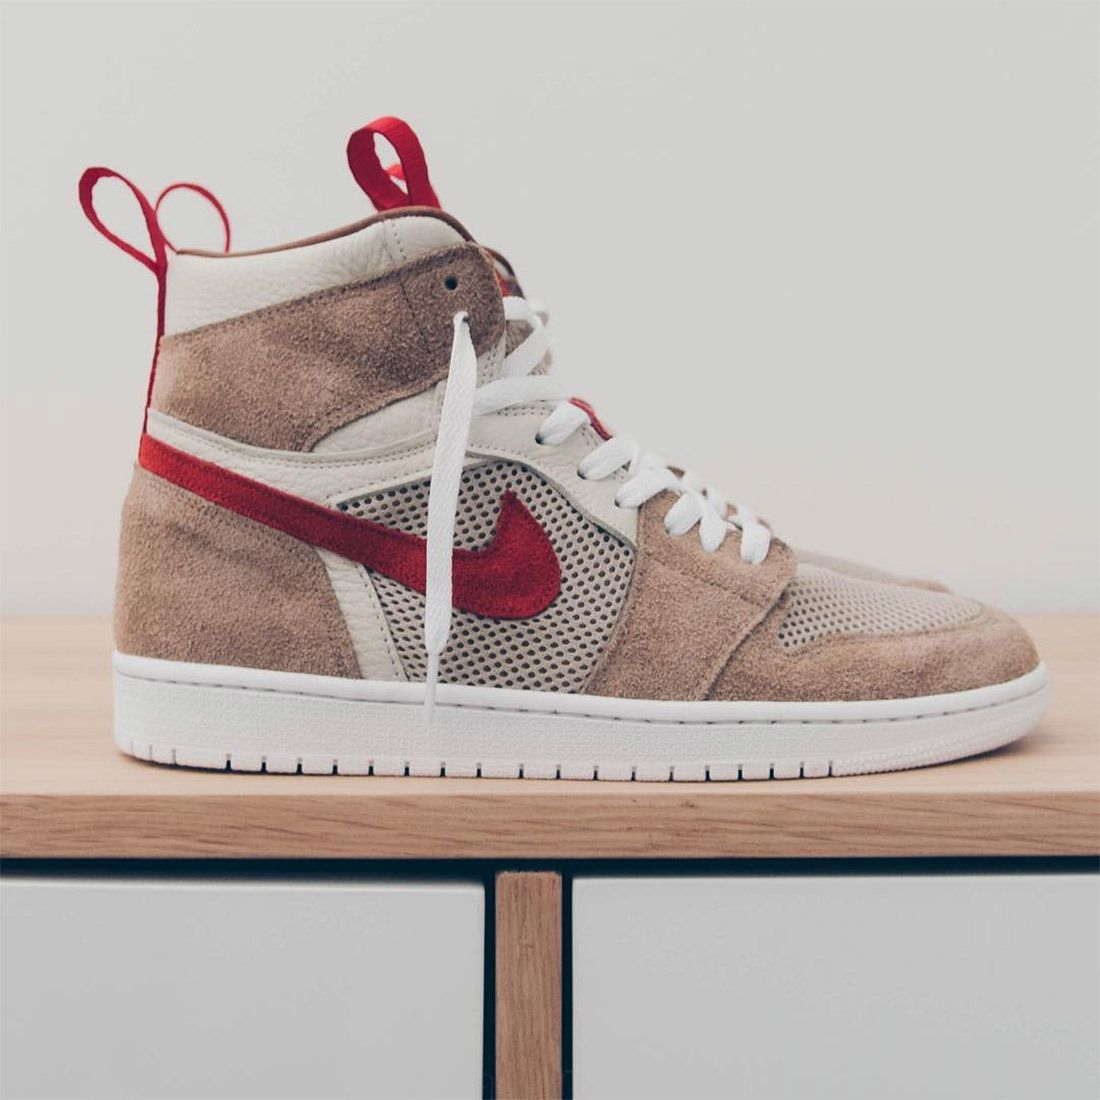 Chase Shiel X Fiammastudios Tom Sachs Nike Mars Yard Shoe Air Jordan 1 Sneaker Freaker 2